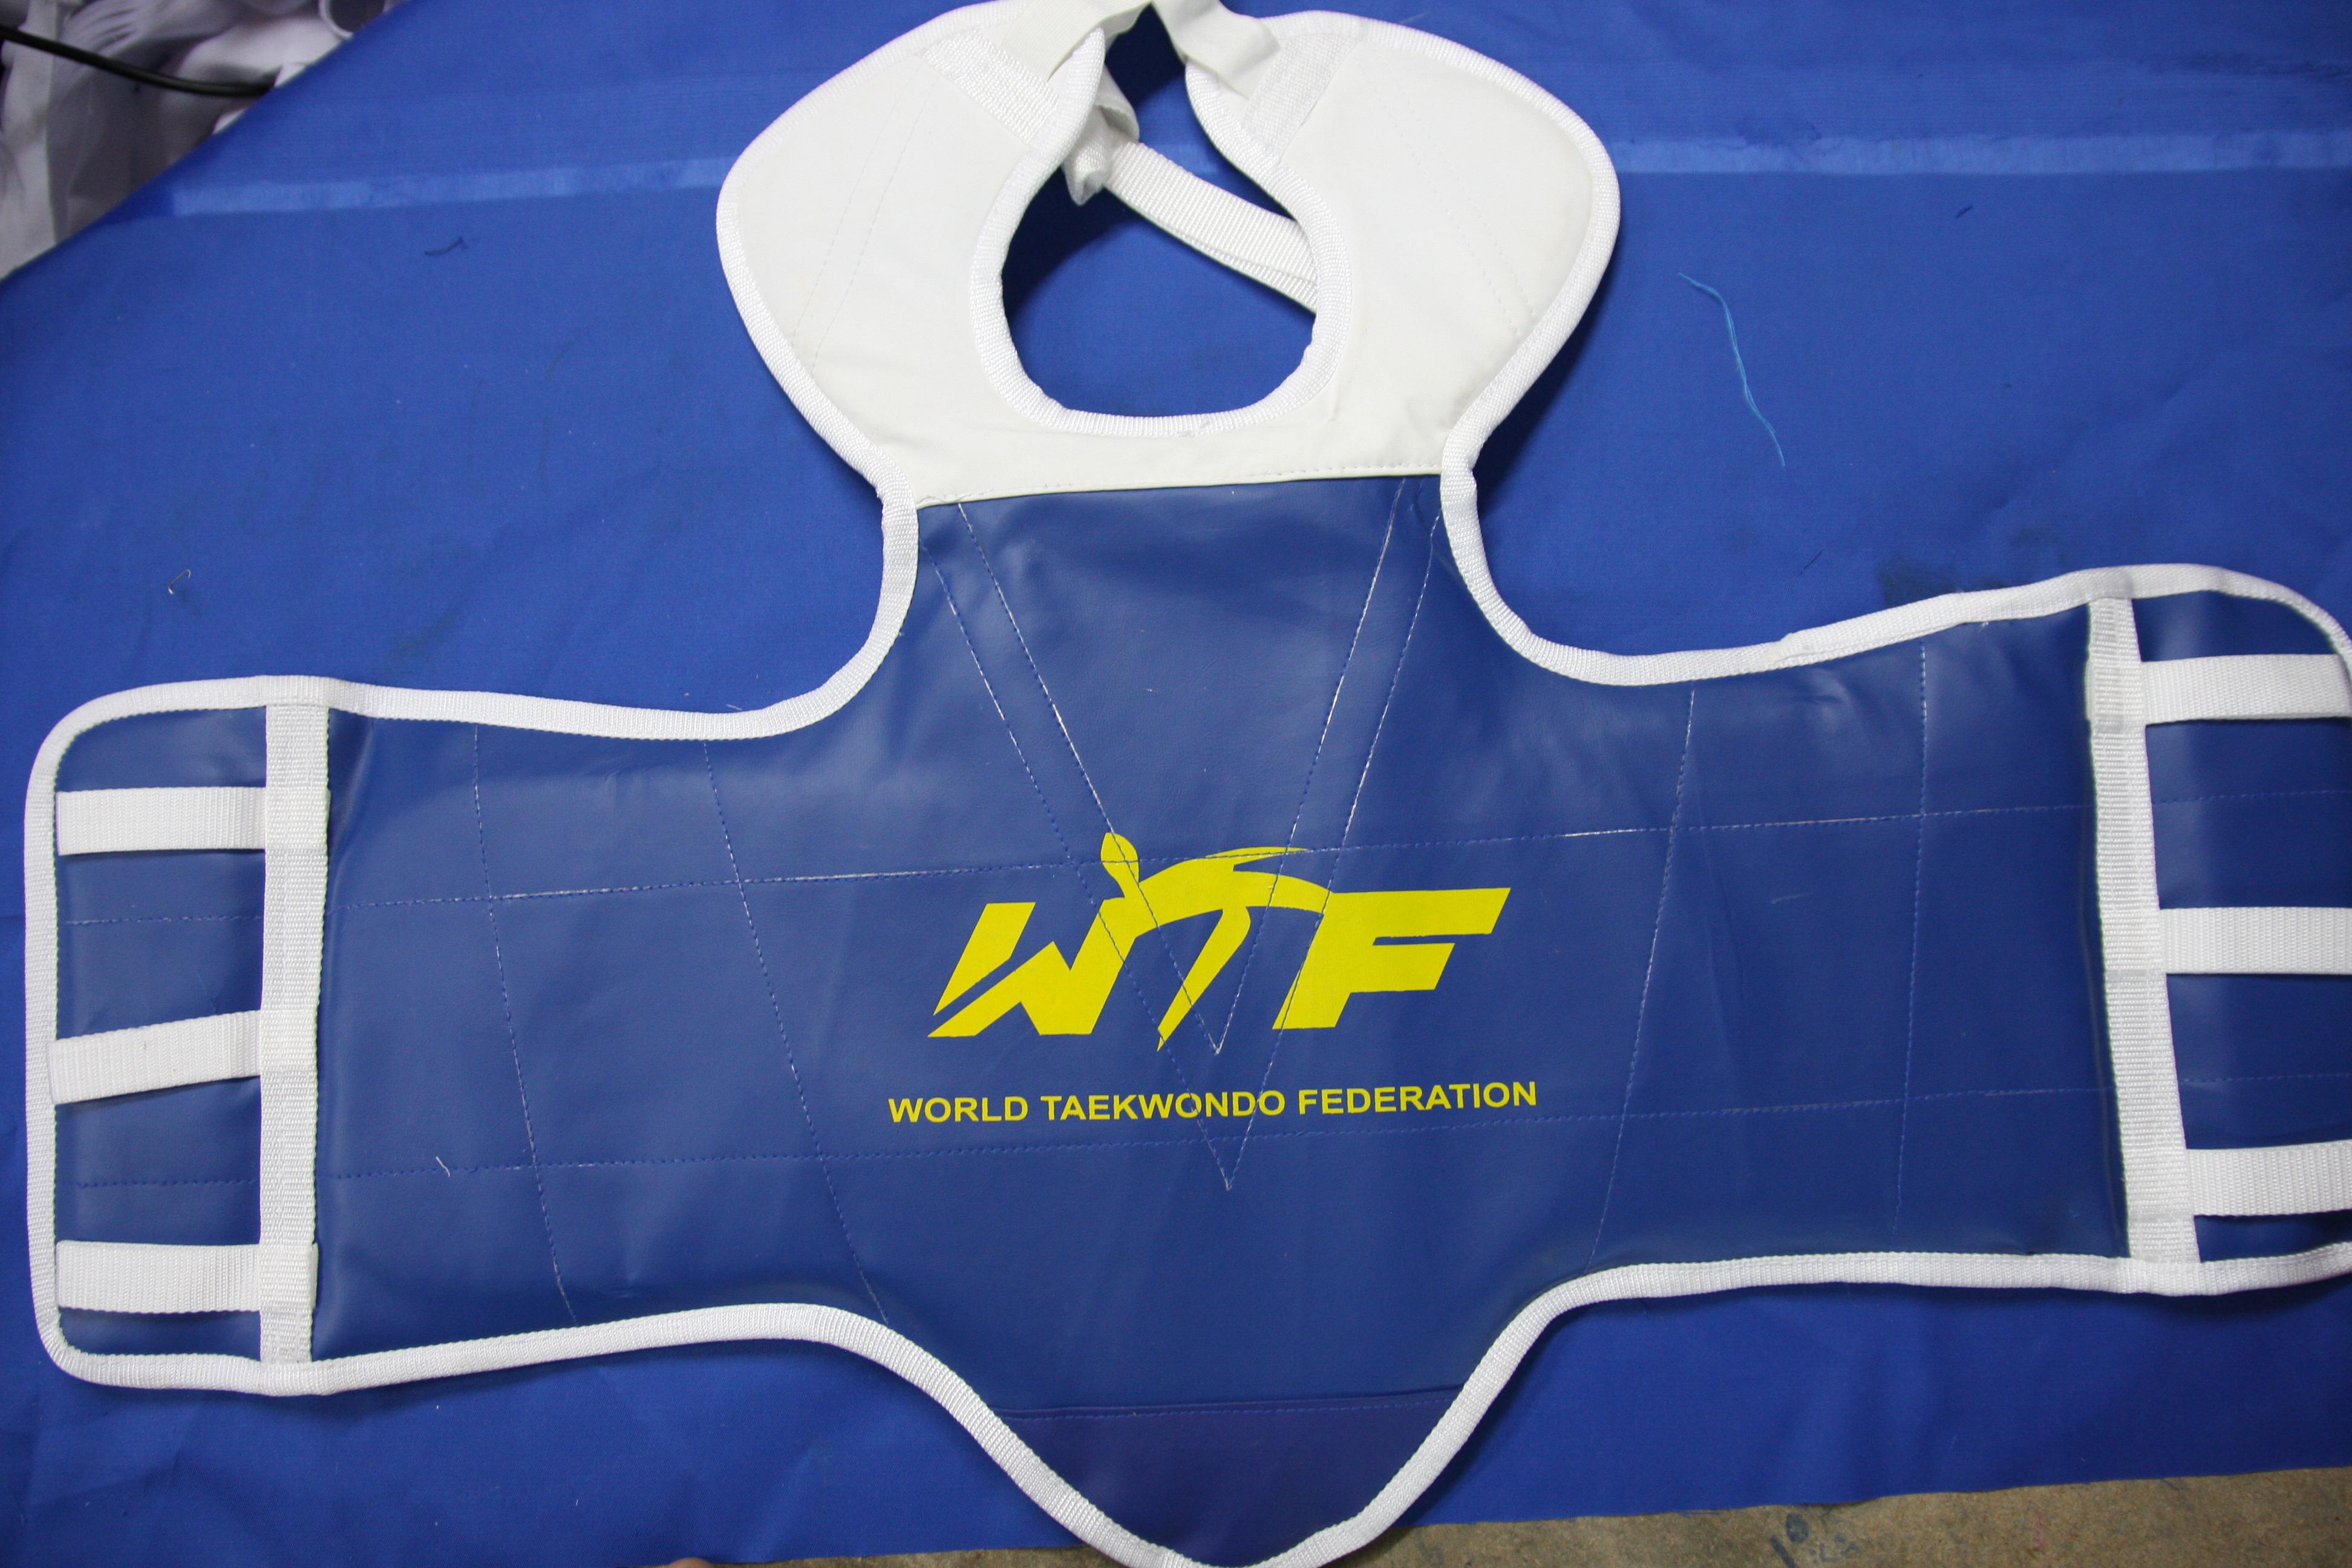 Giáp Taekwondo